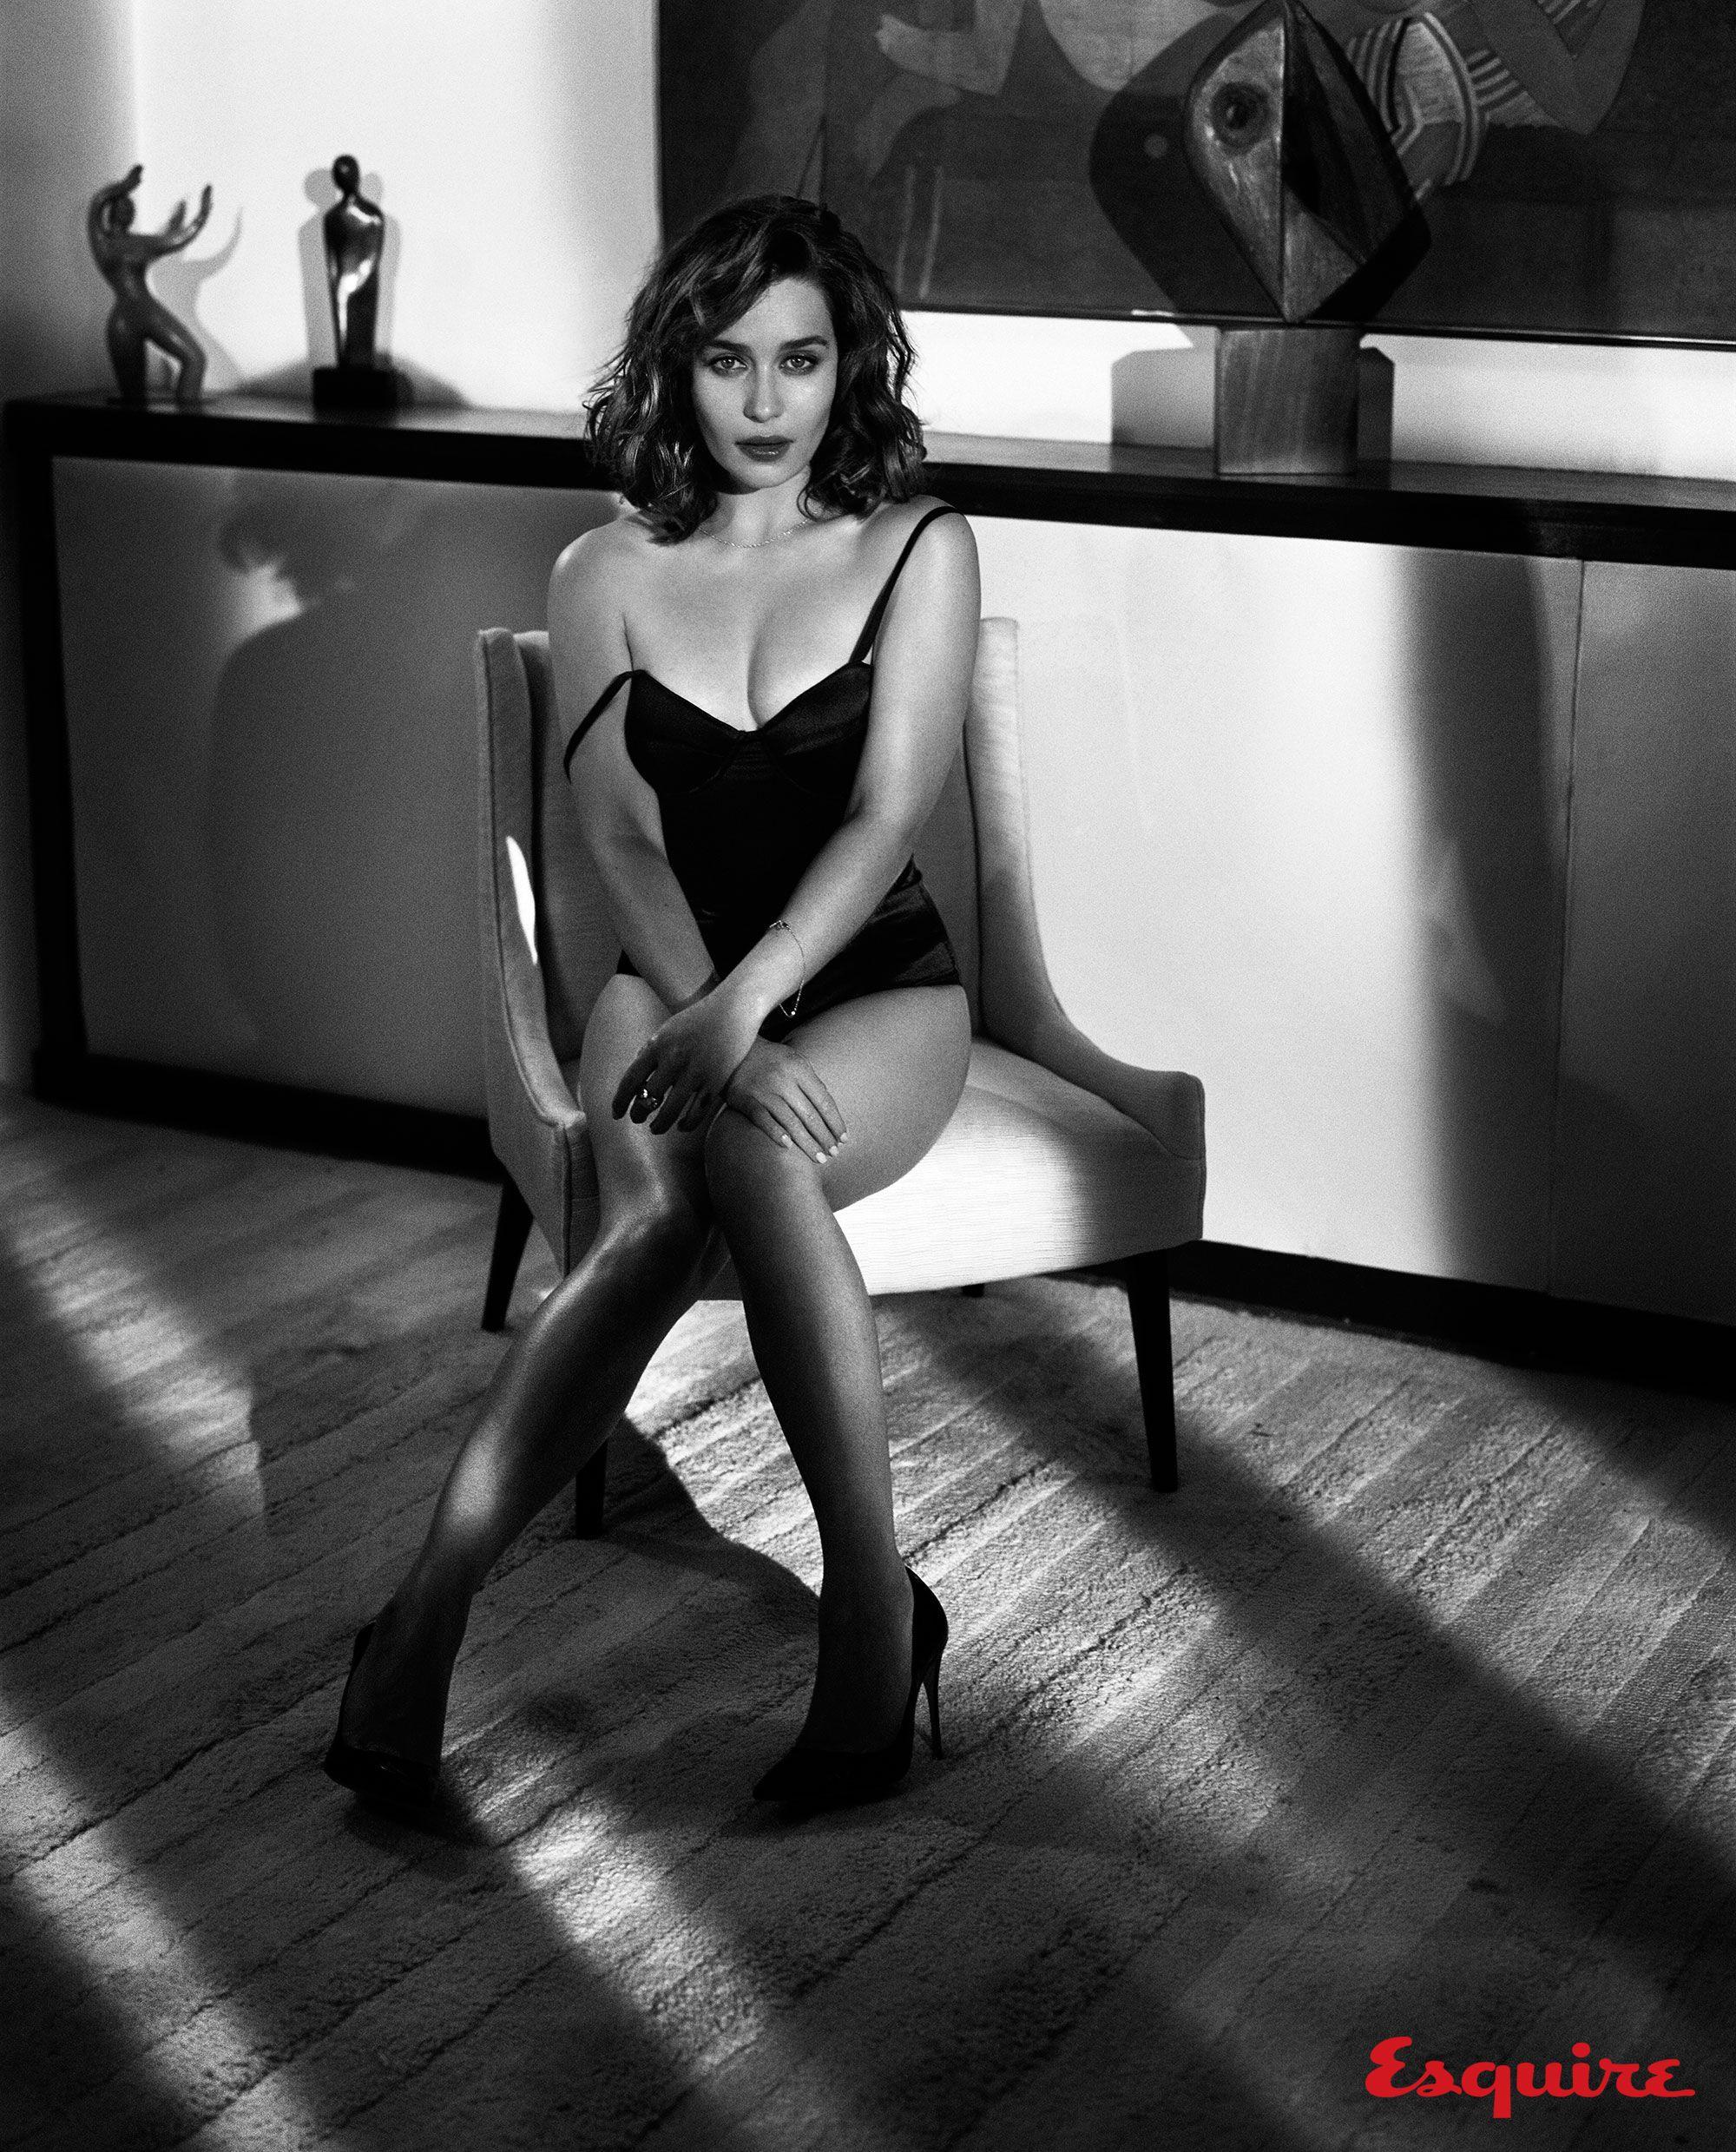 1000 images about emilia clarke on pinterest emilia - Hi Res Photos Of The Sexy Actress Emilia Clarke Daenerys Targaryen Mother Of Dragons